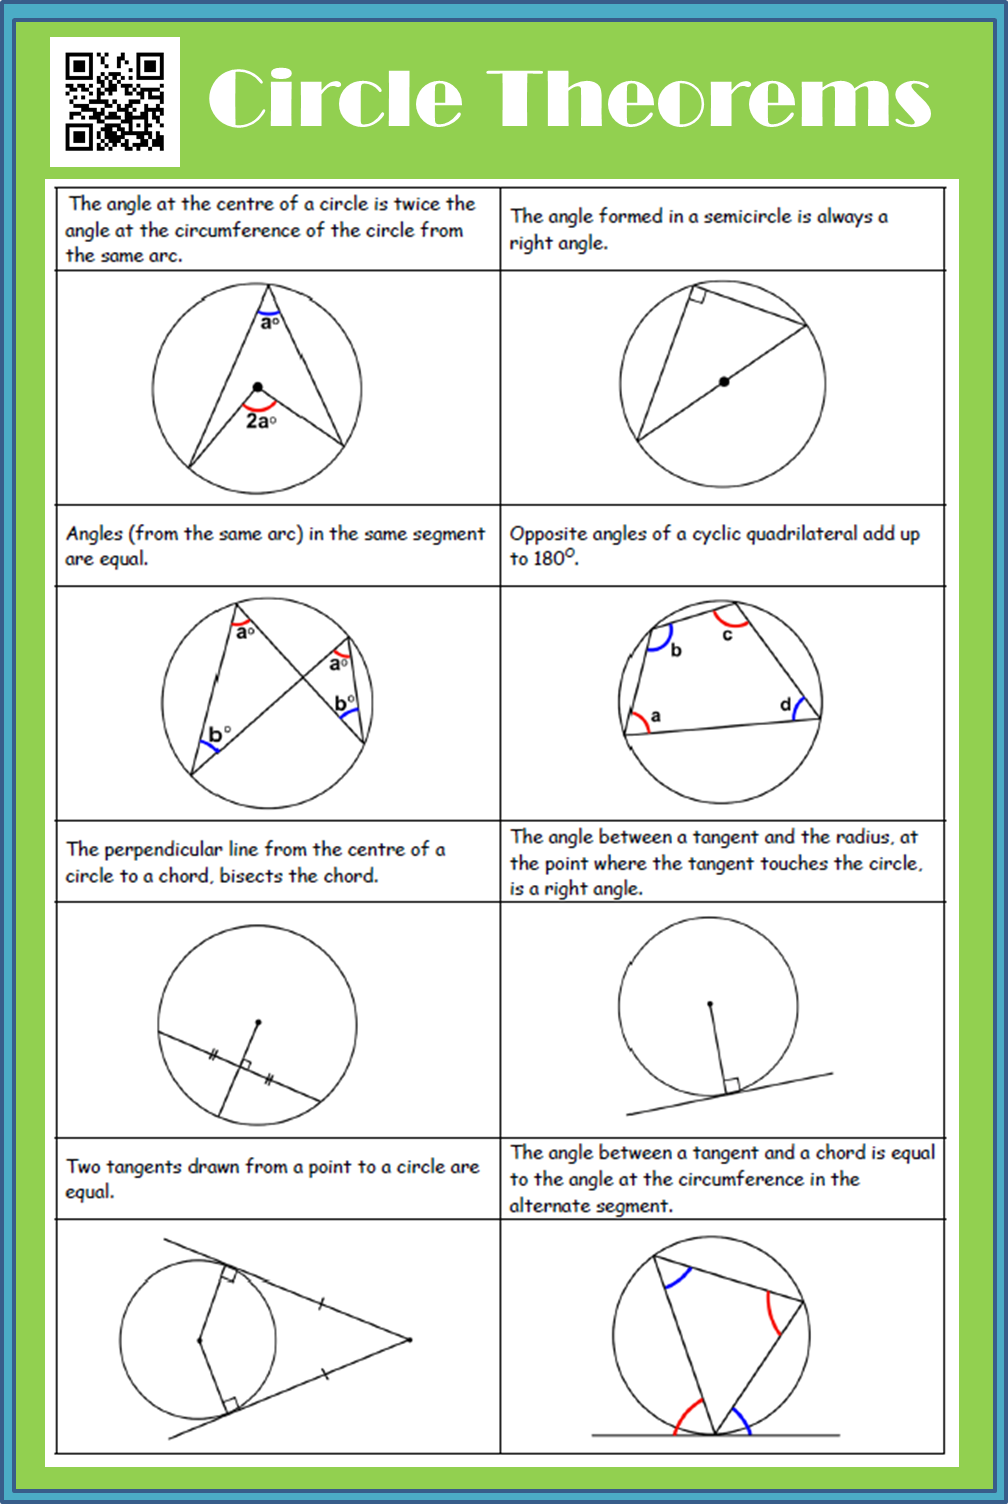 Circle Theorems Maths Revision Gcse Maths Revision Circle Theorems Gcse Math